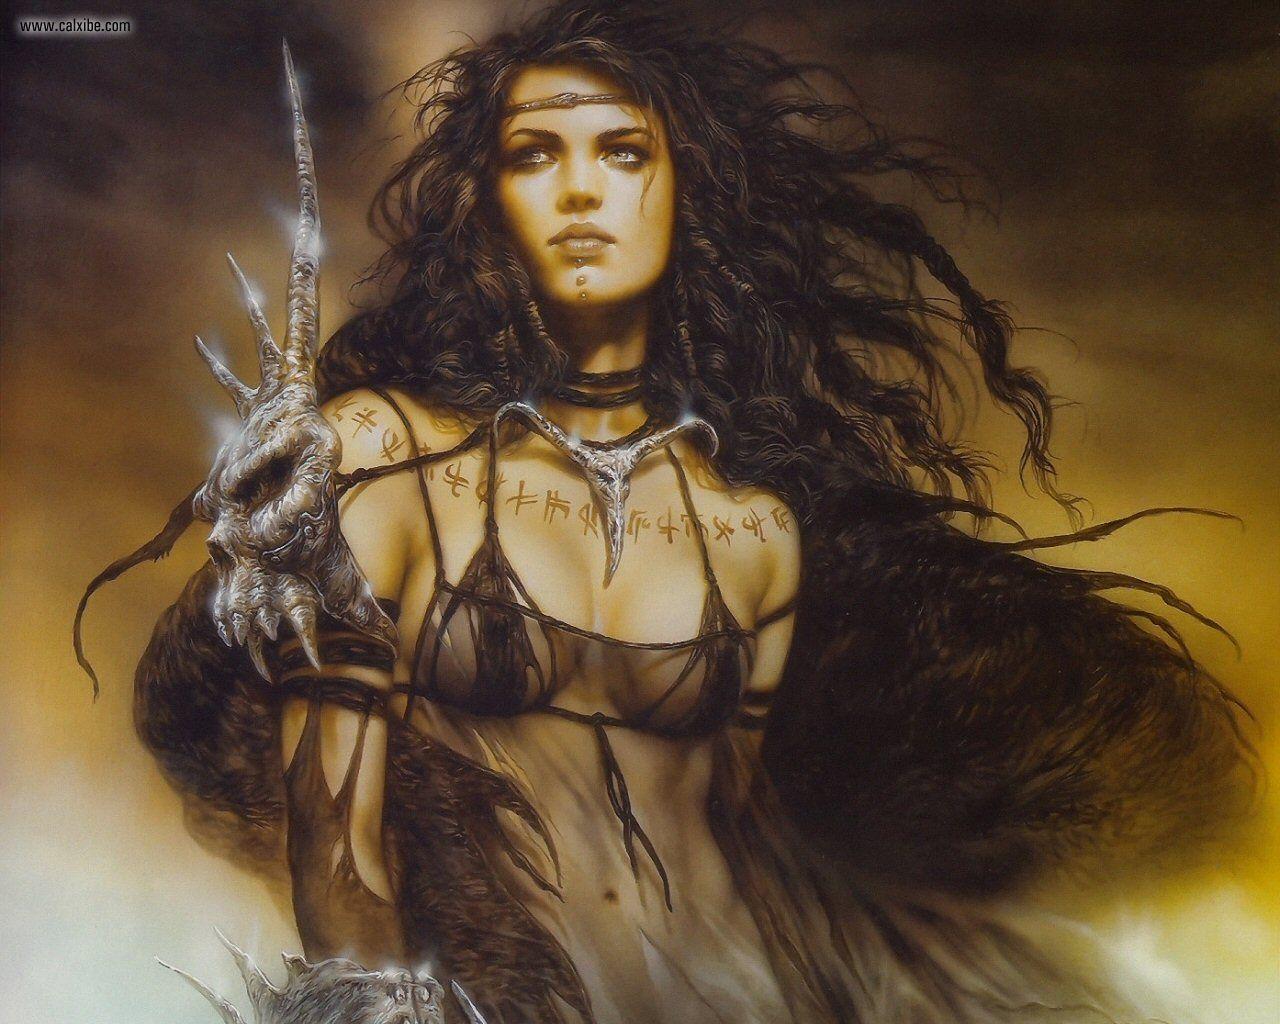 Gothic warrior women sexy pics